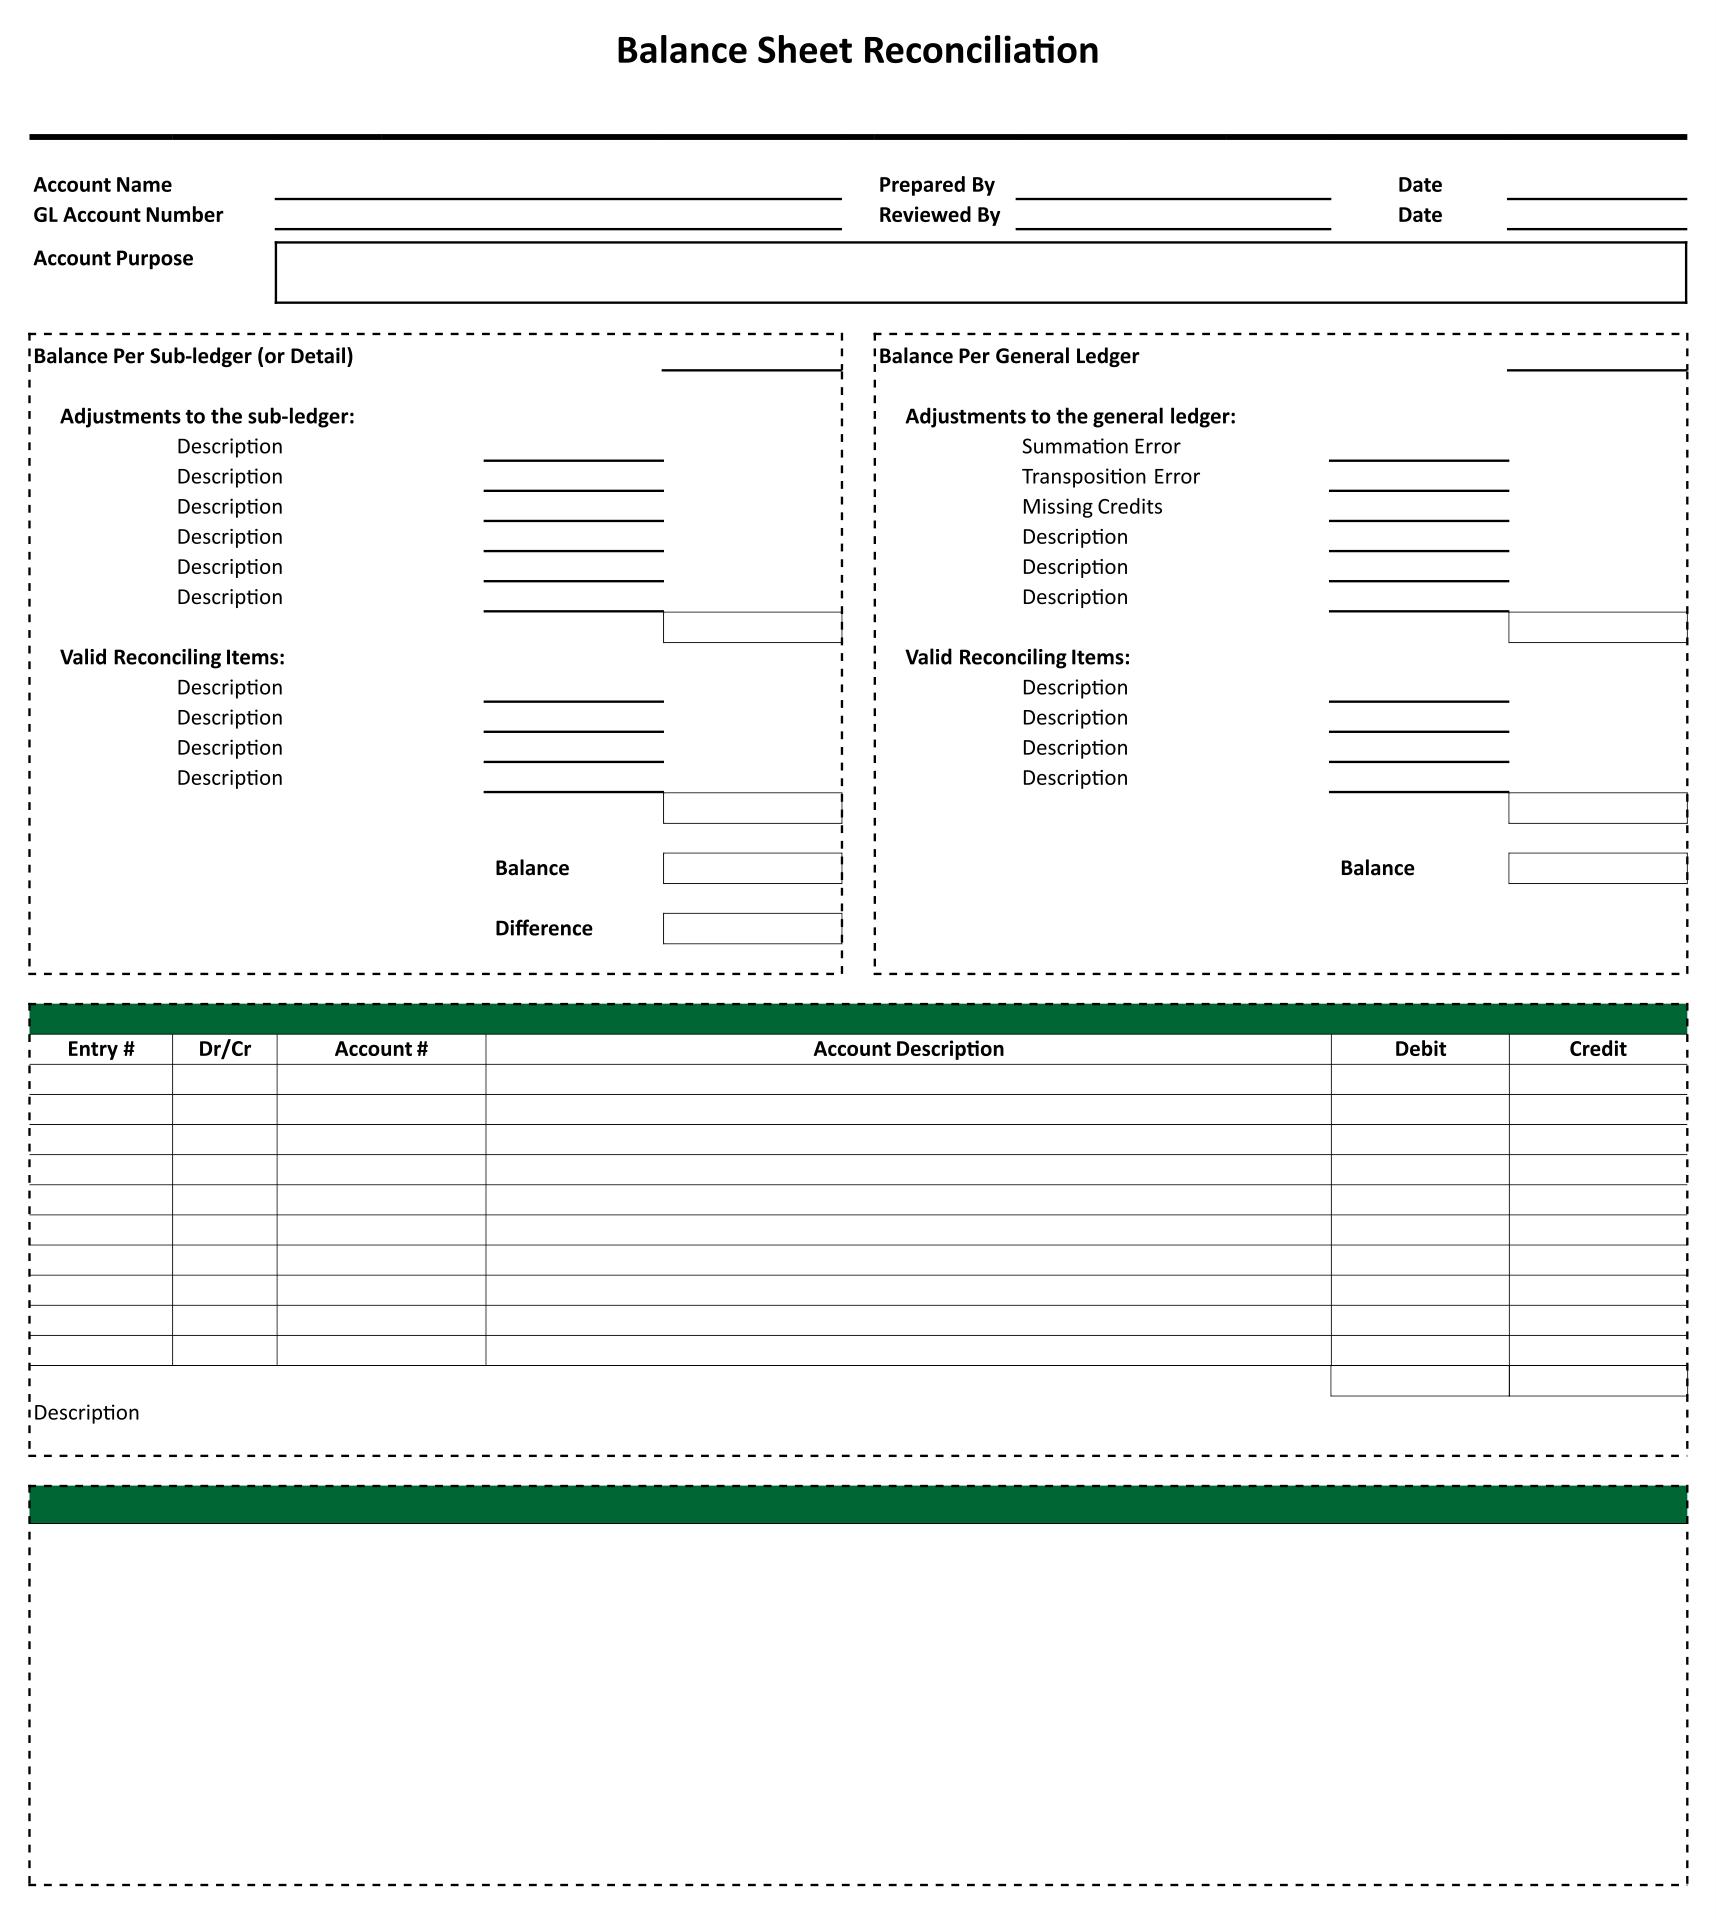 General Ledger Balance Sheet Reconciliation